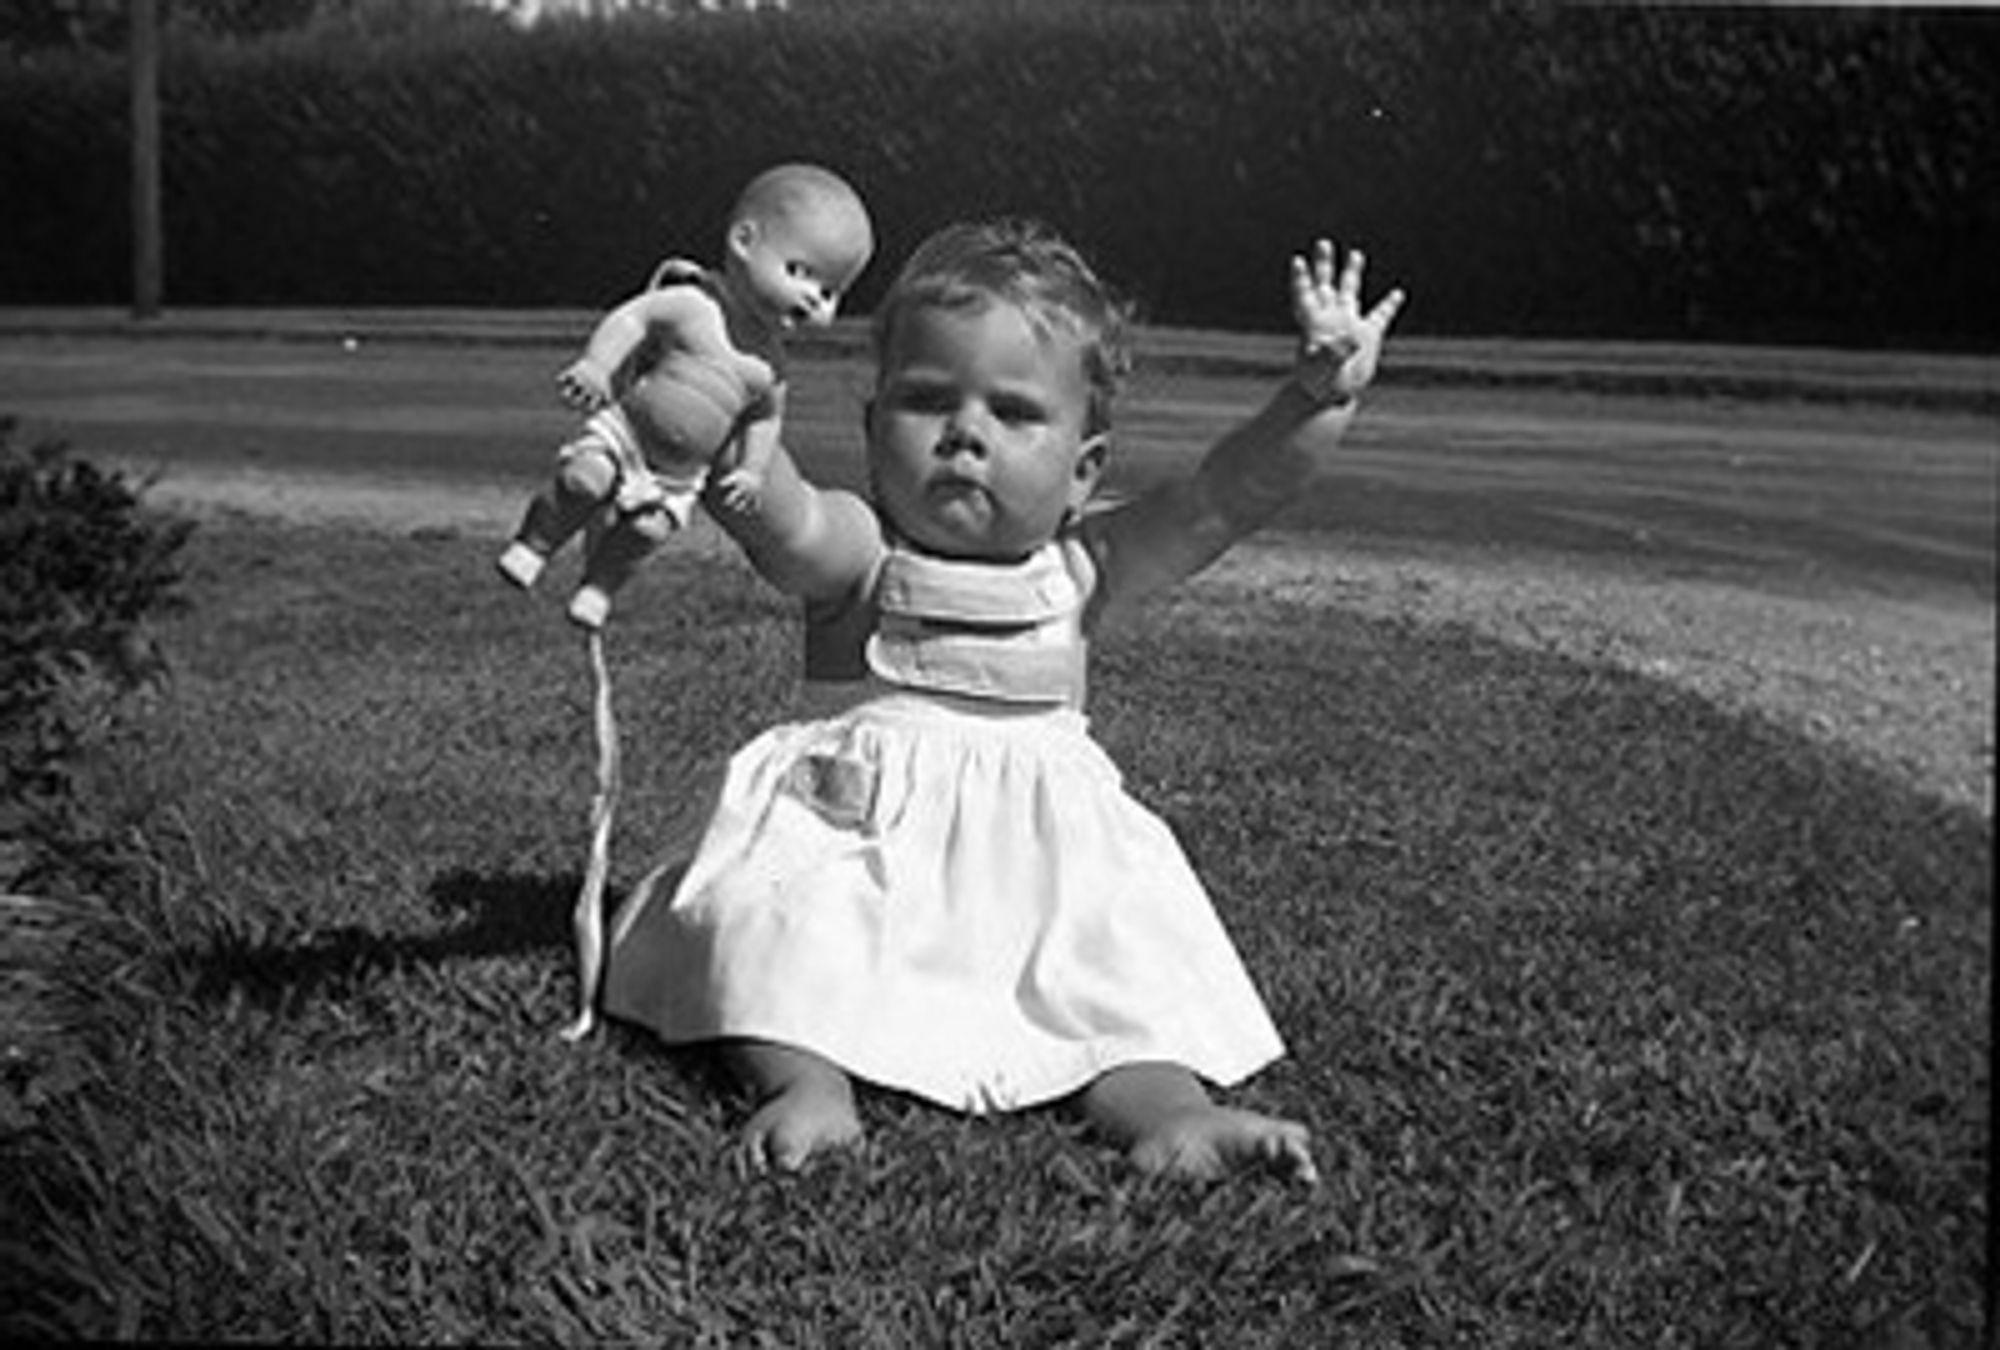 Barn med dukke. Foto: Vivian Maier.